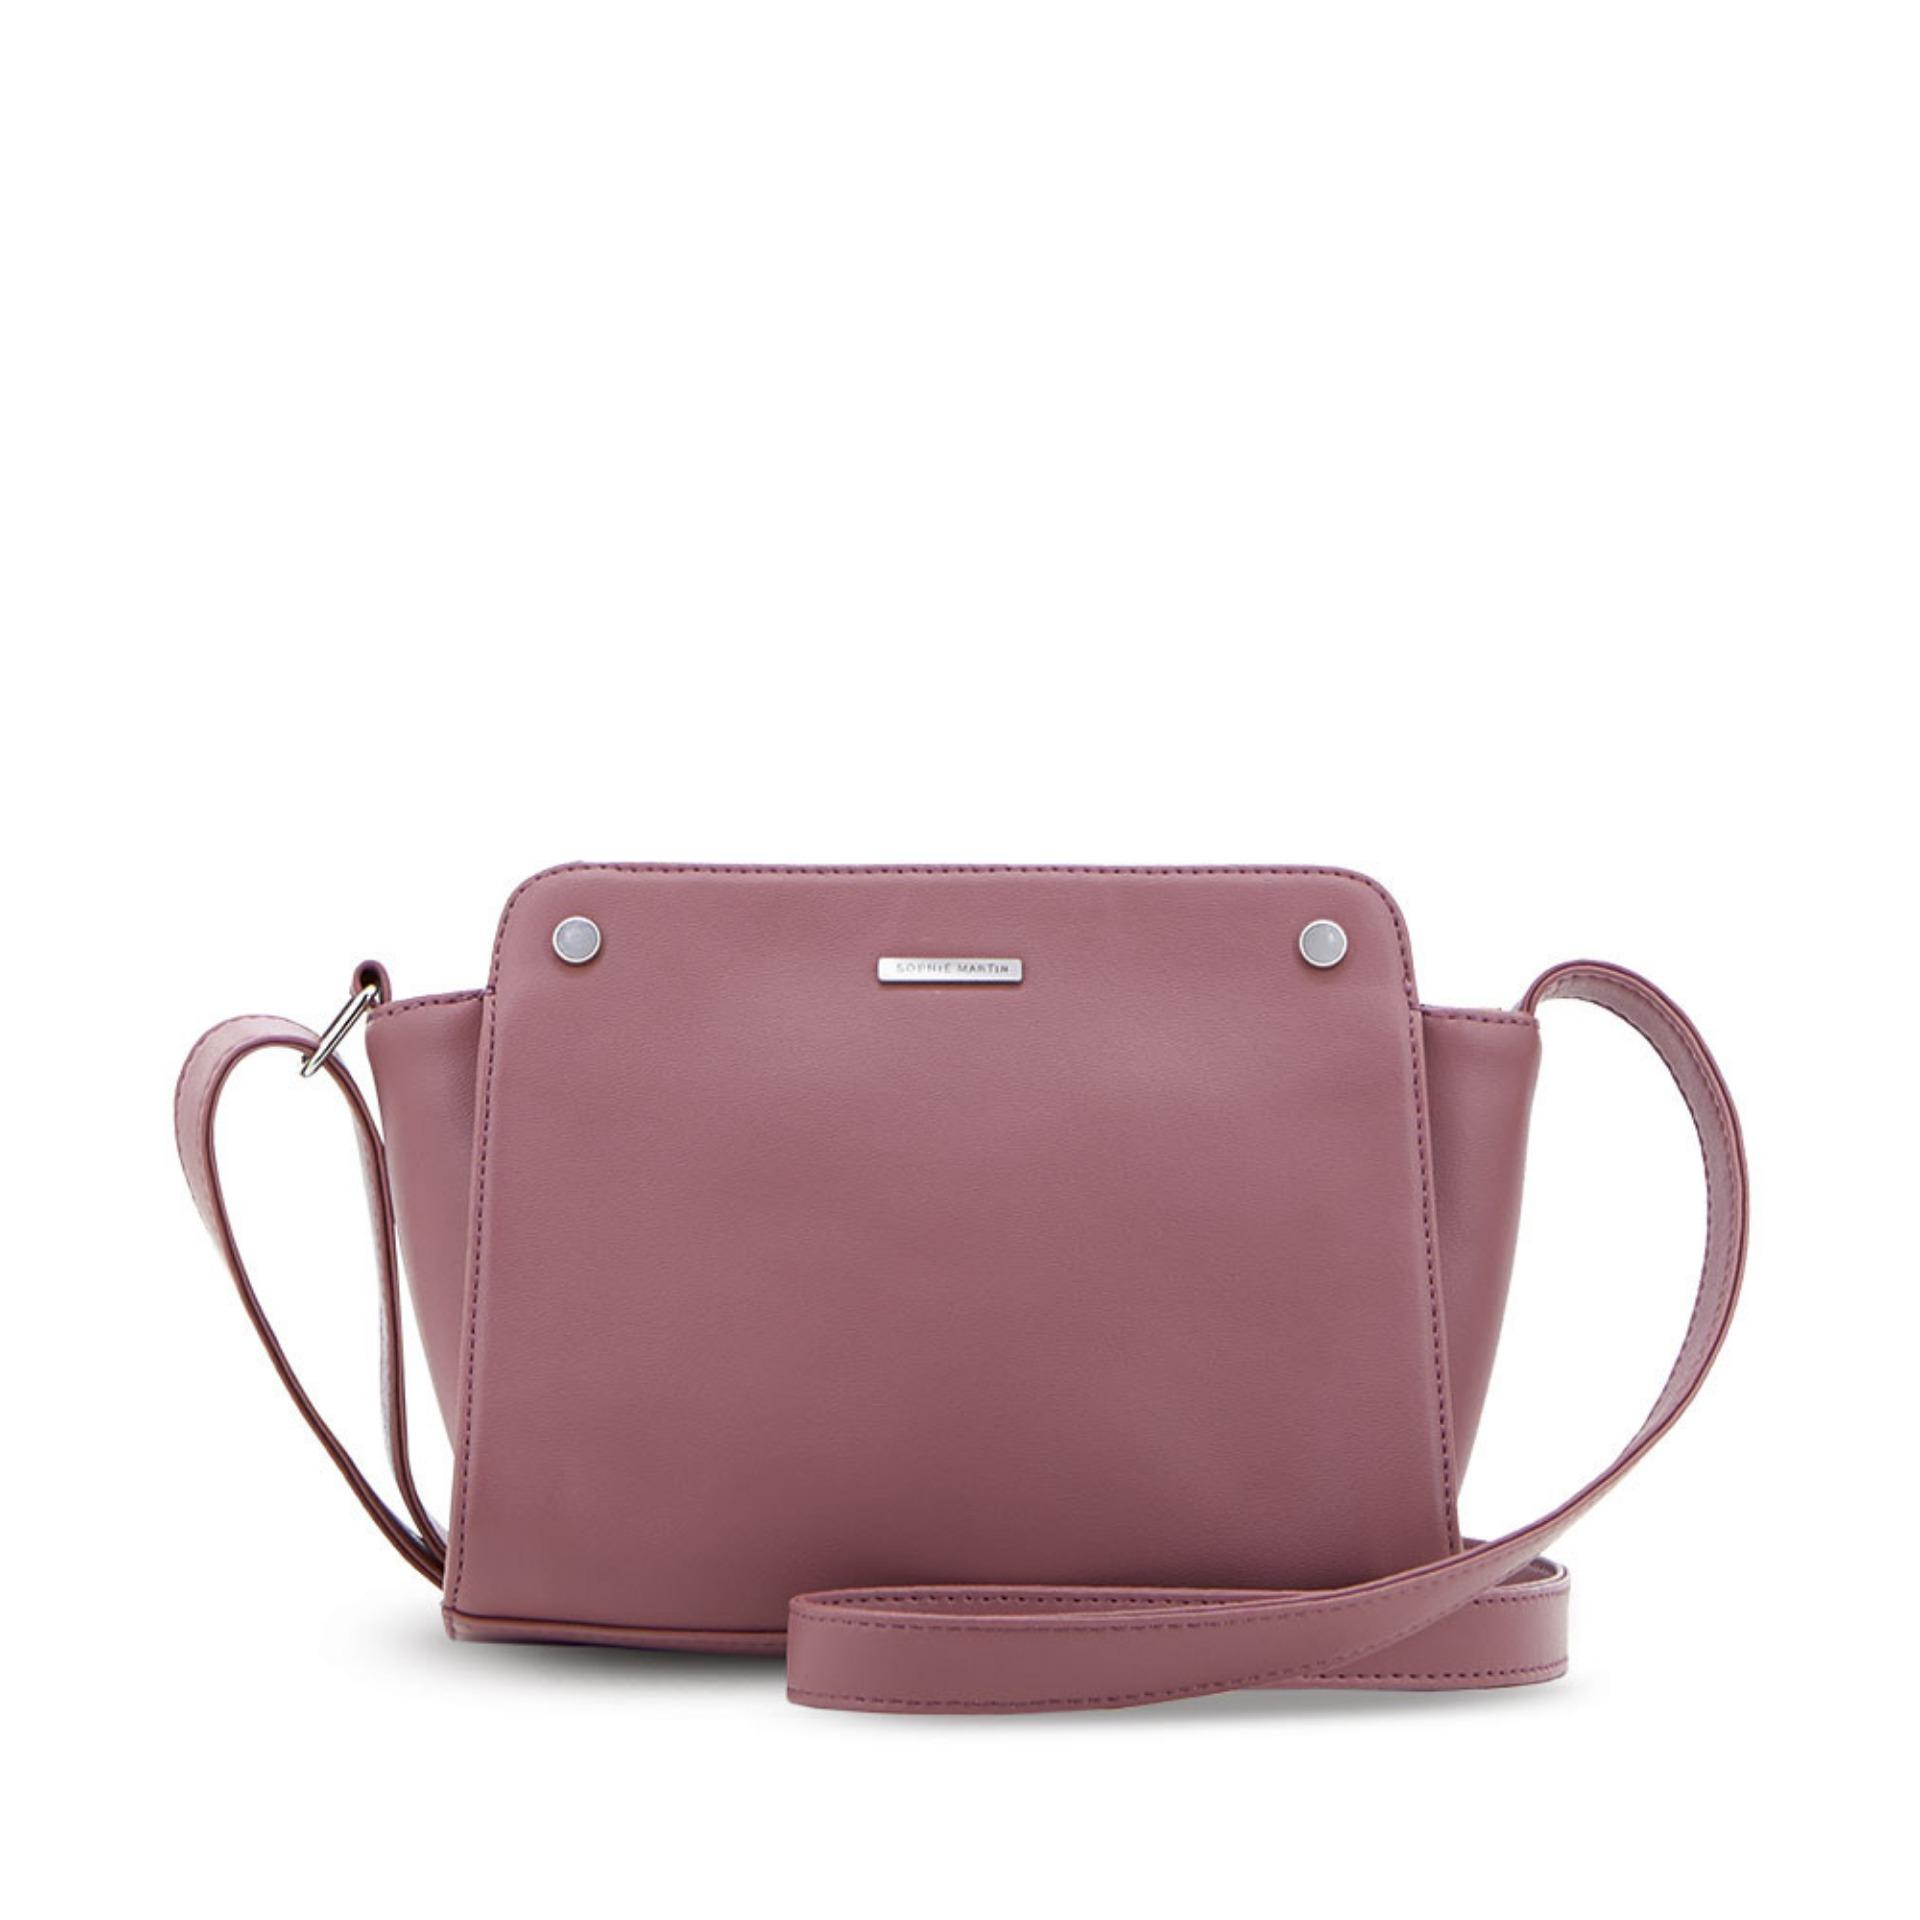 Sophie Paris Tas Selempang Wanita Import Branded Liana Bag T4482D1 - Dusty  Pink e64786eb4f